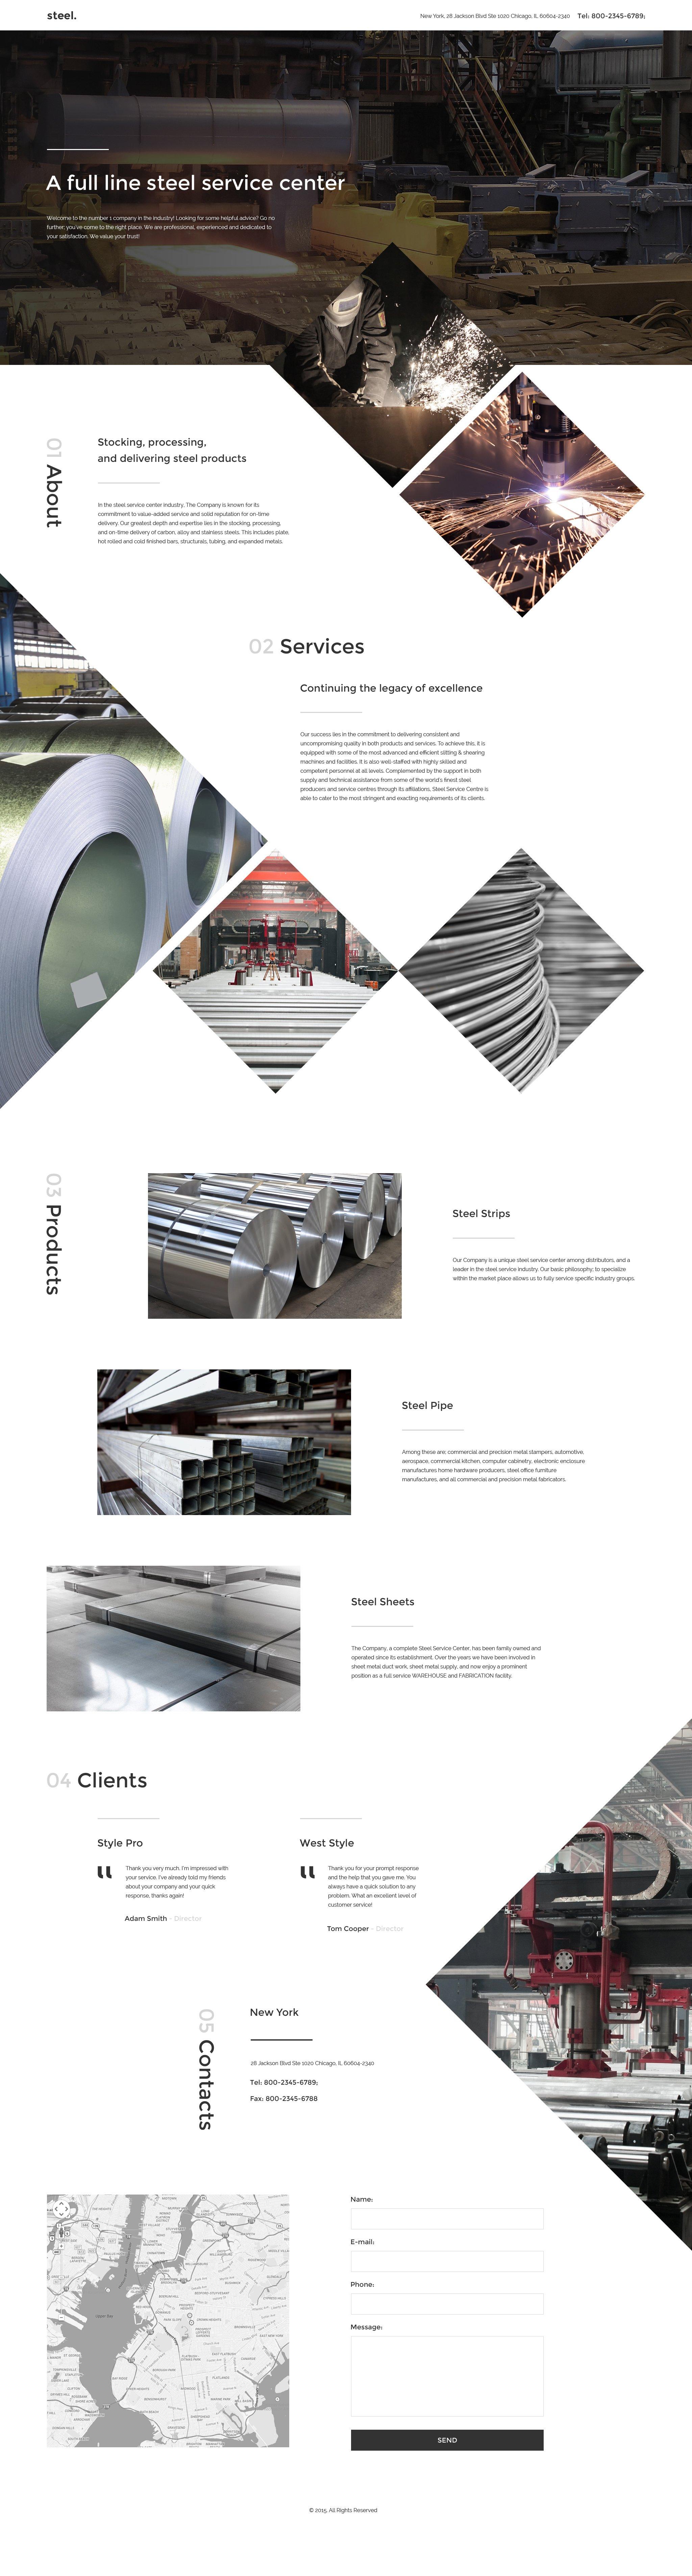 Responsywny szablon Landing Page Steelworks #57716